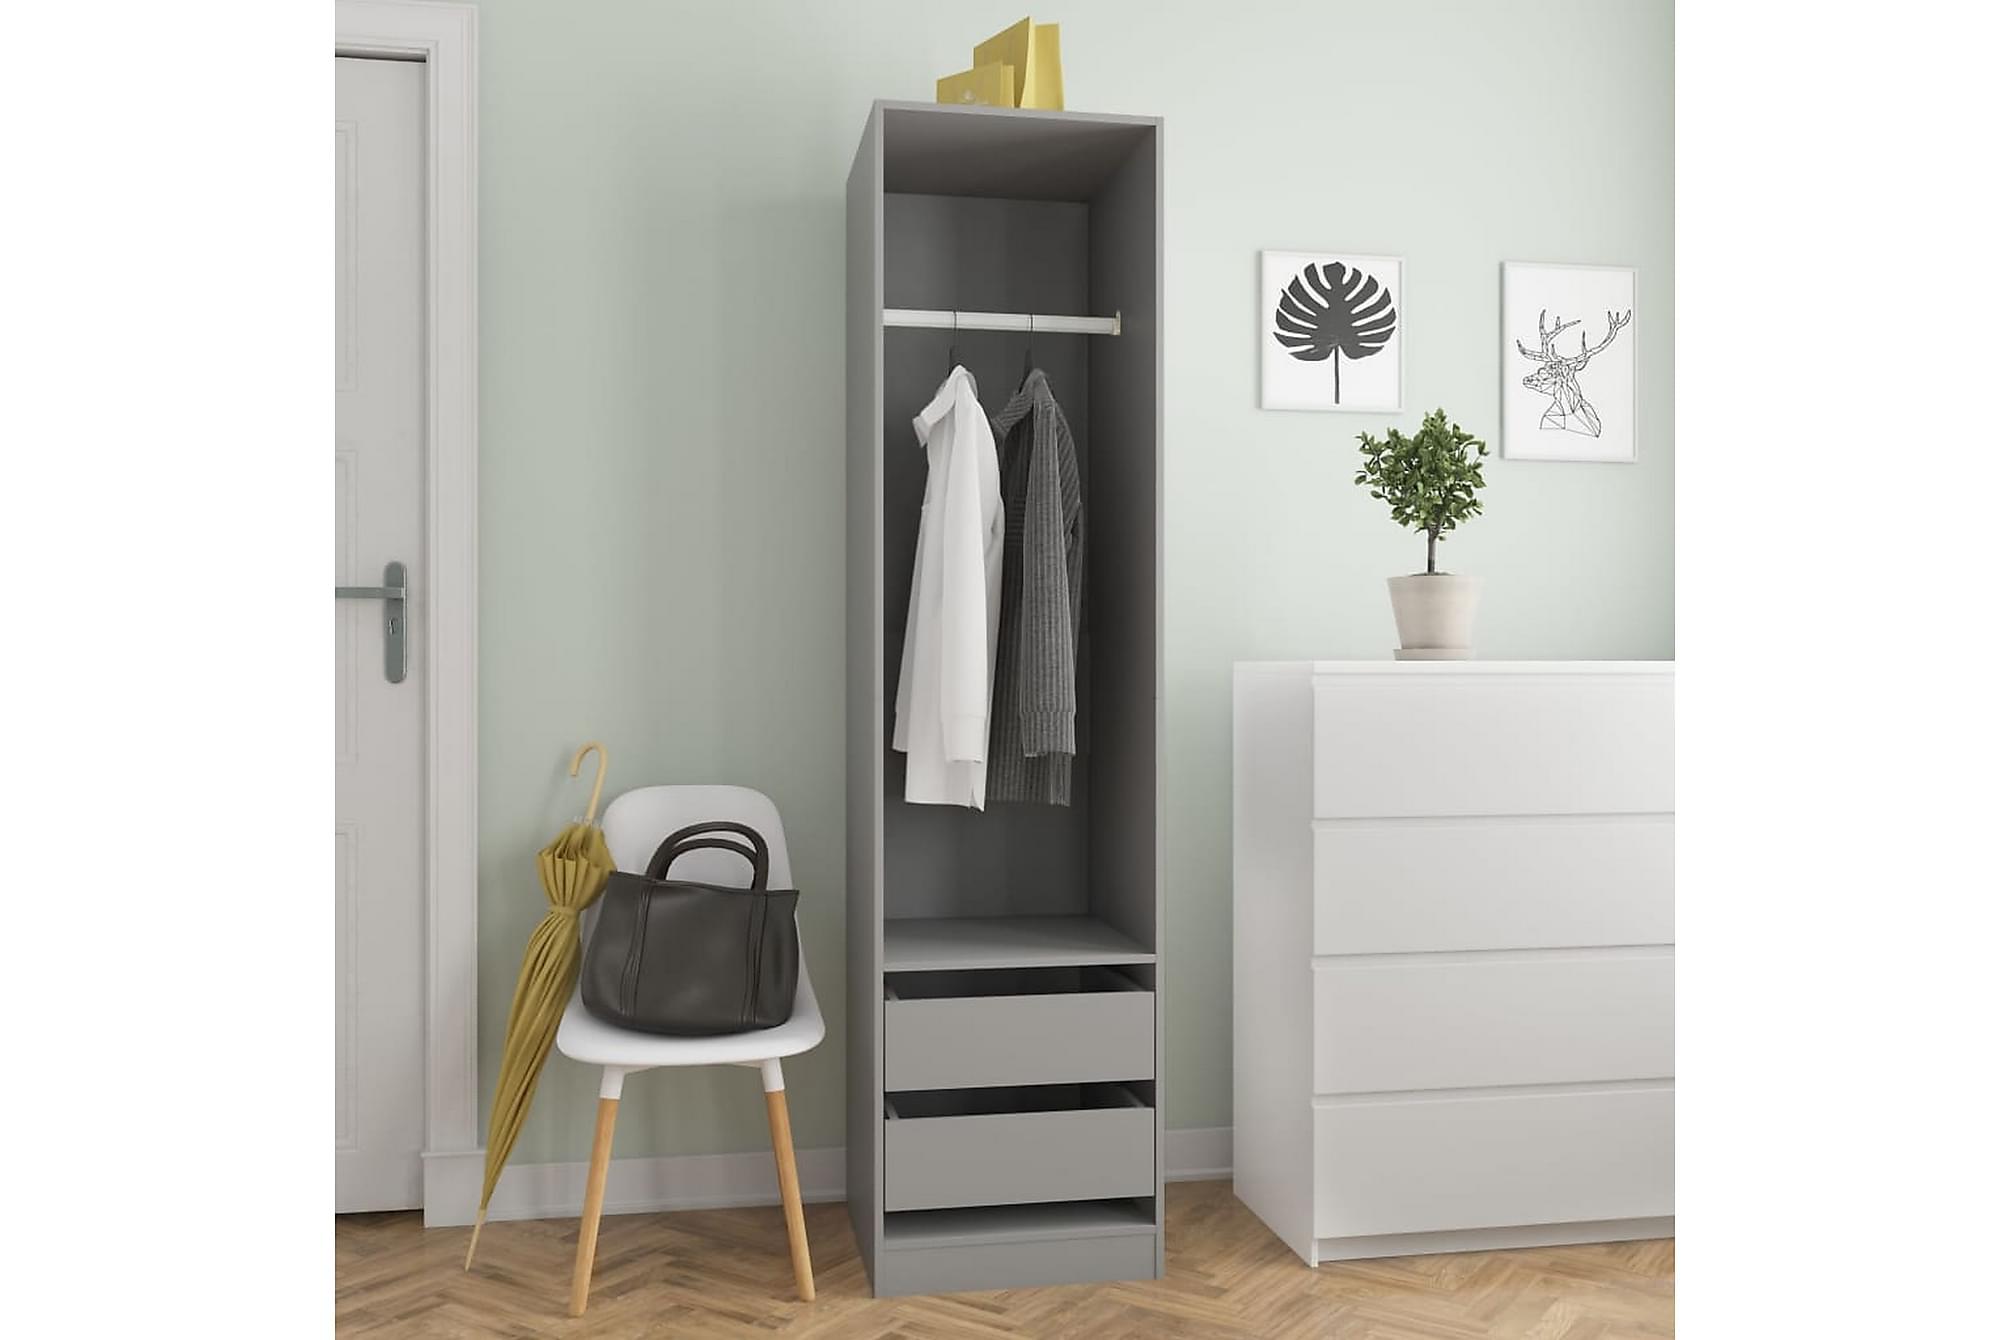 Garderob med lådor grå 50x50x200 cm spånskiva